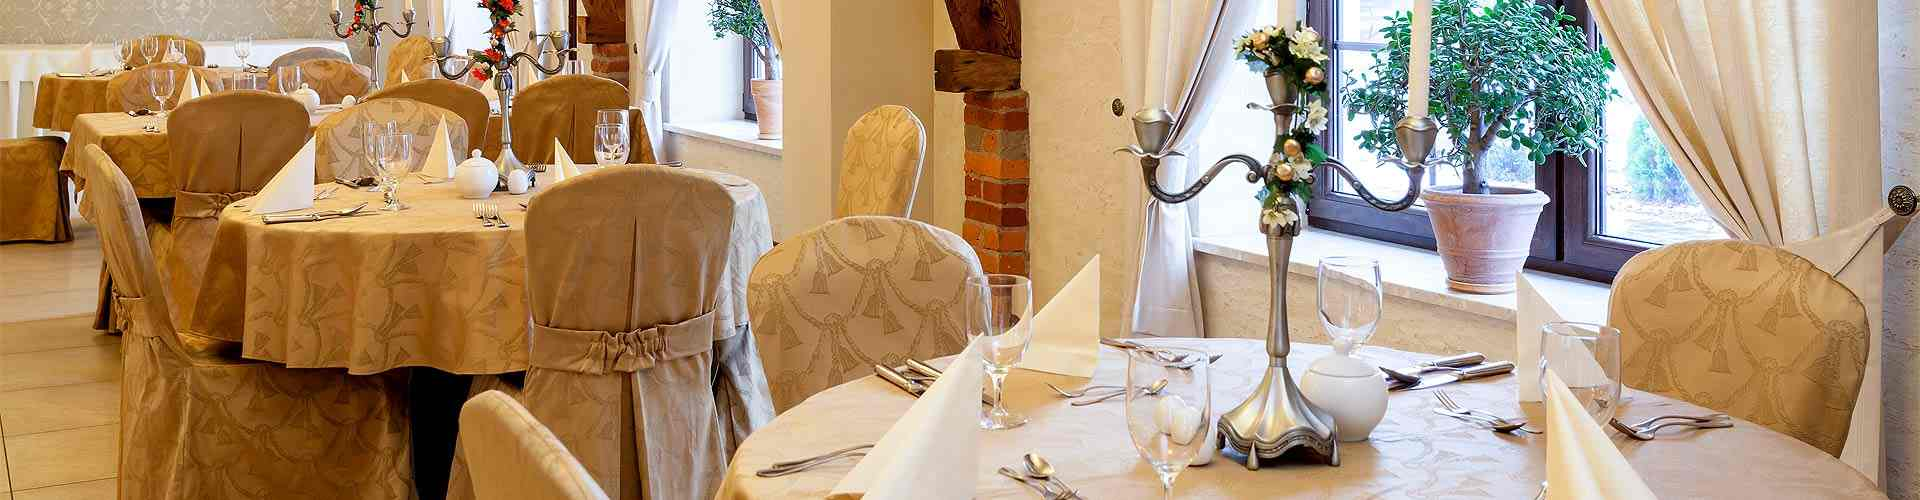 restaurantes en Burgos